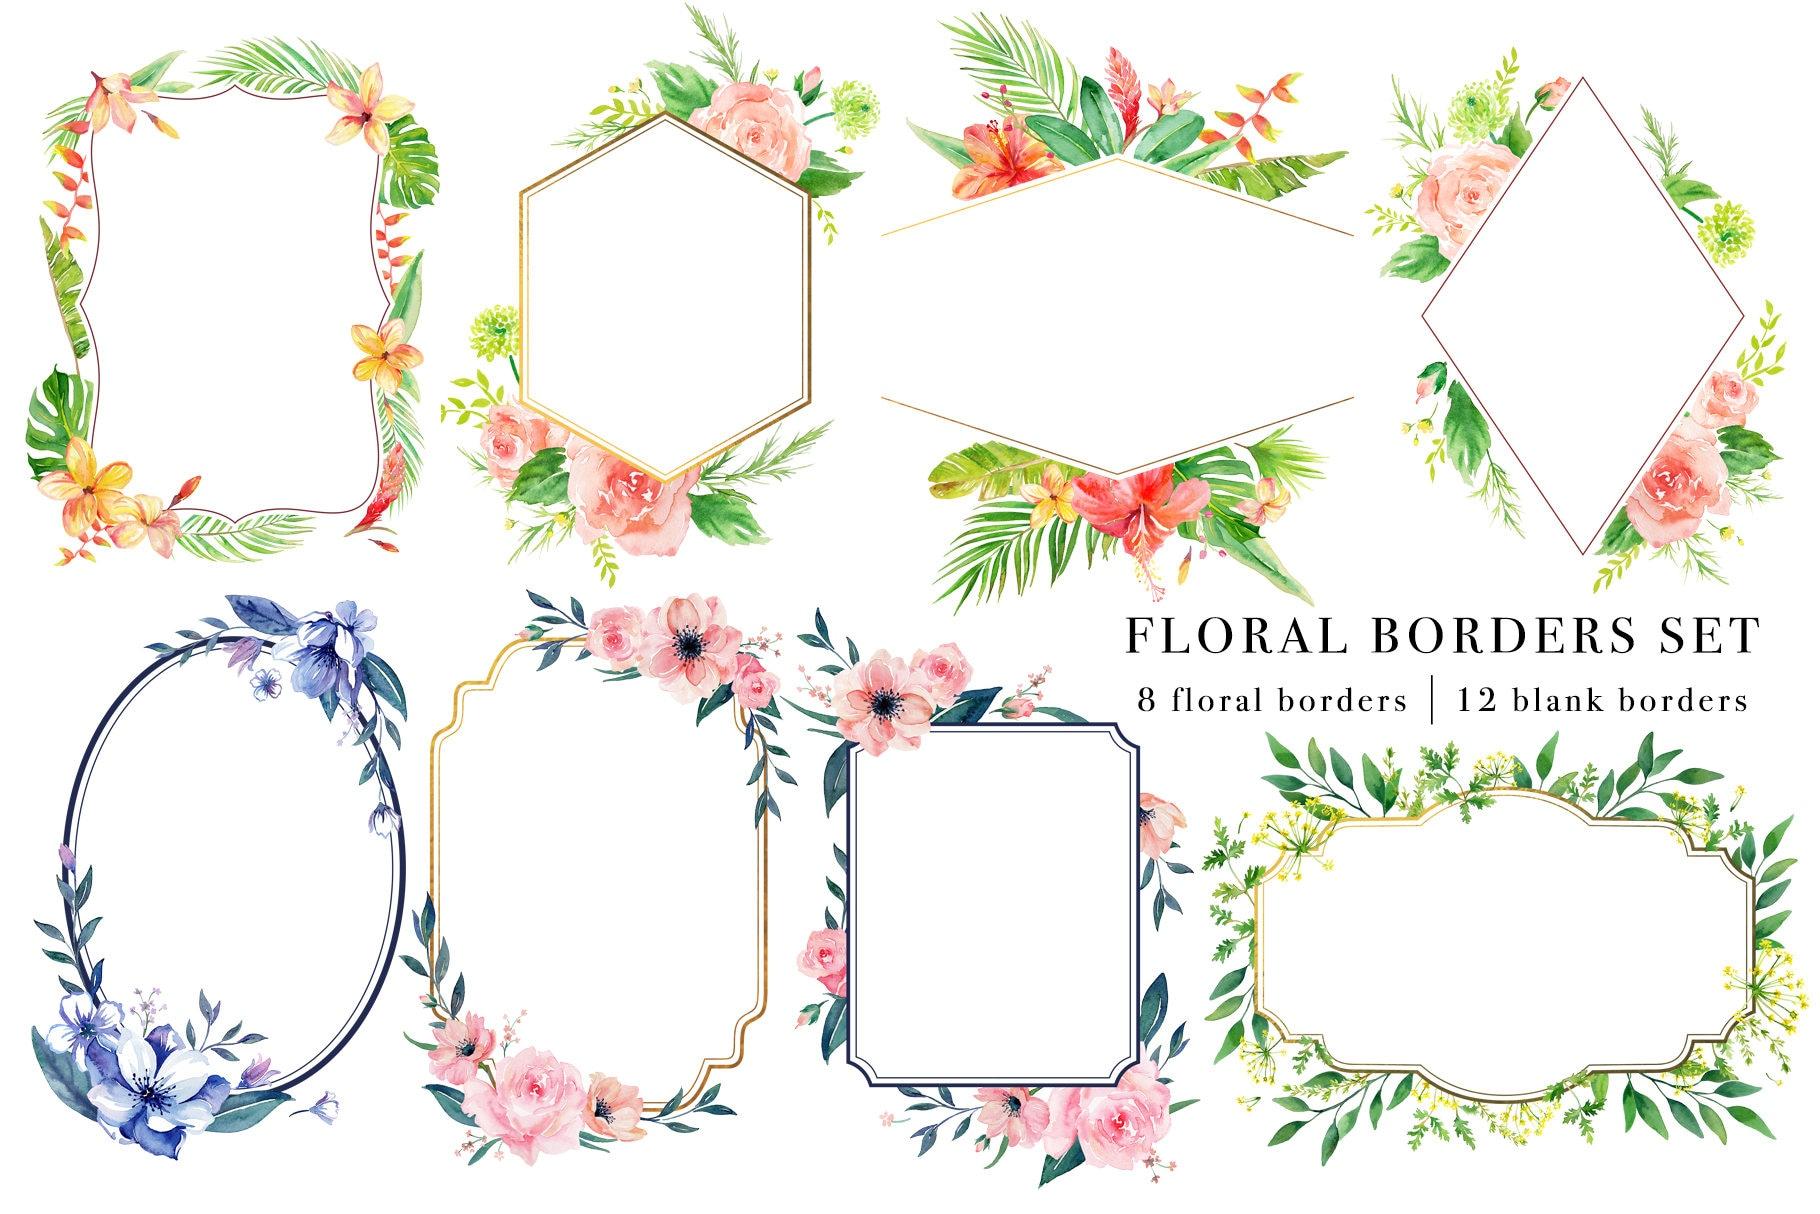 Floral Borders Set Handpainted Watercolor Clipart Digital